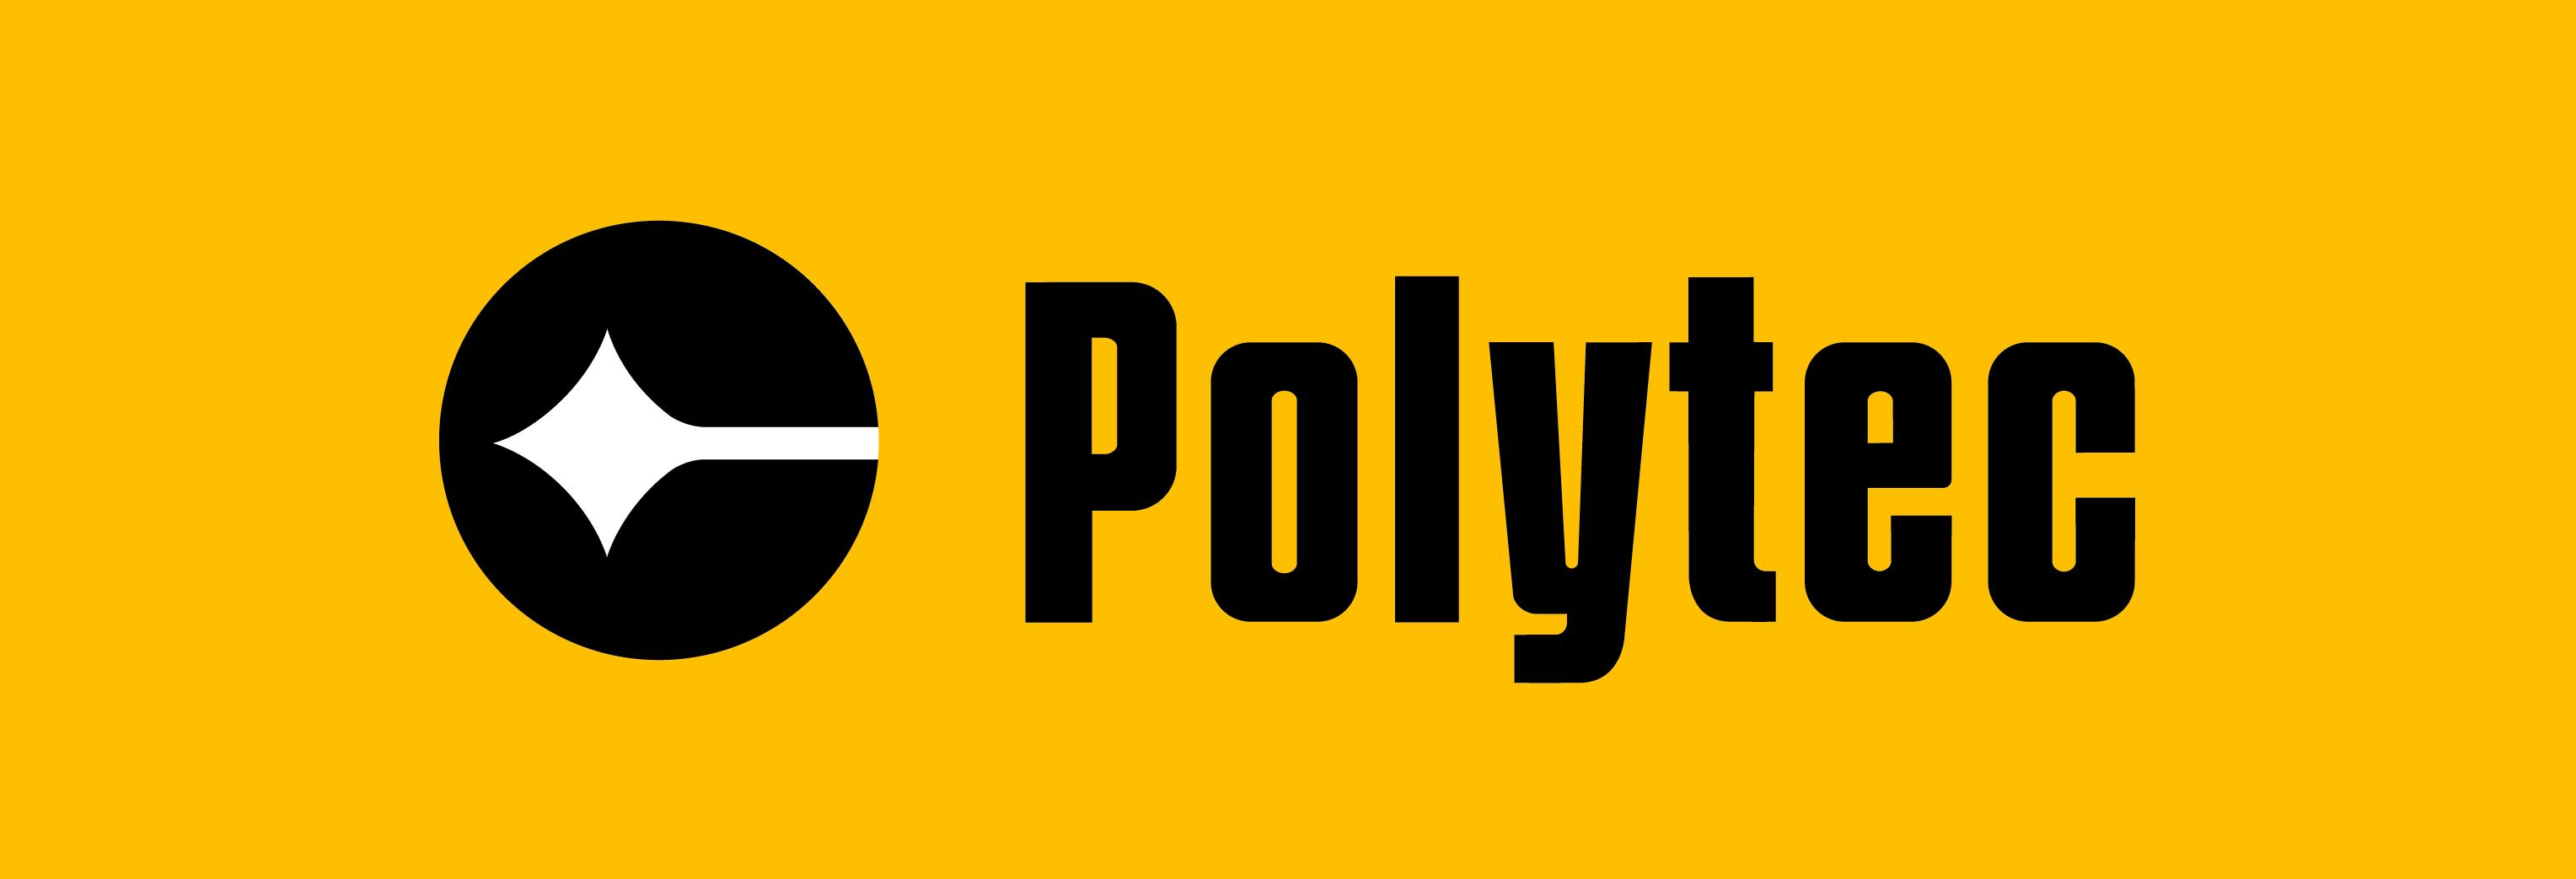 1574328494-polytec-france.jpg